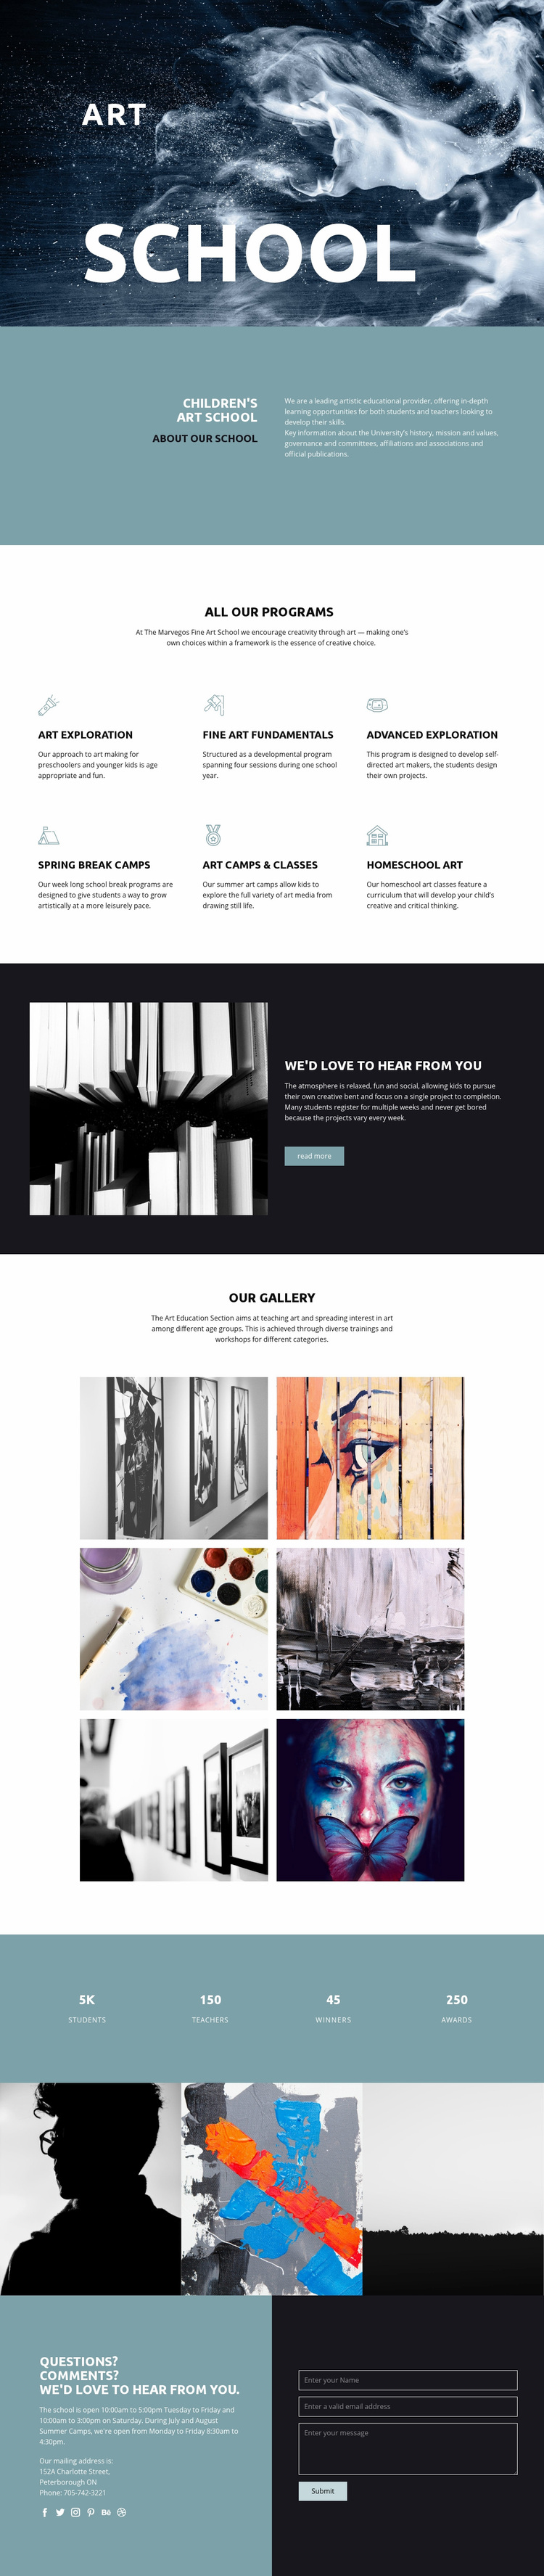 School of artistic education Web Page Designer